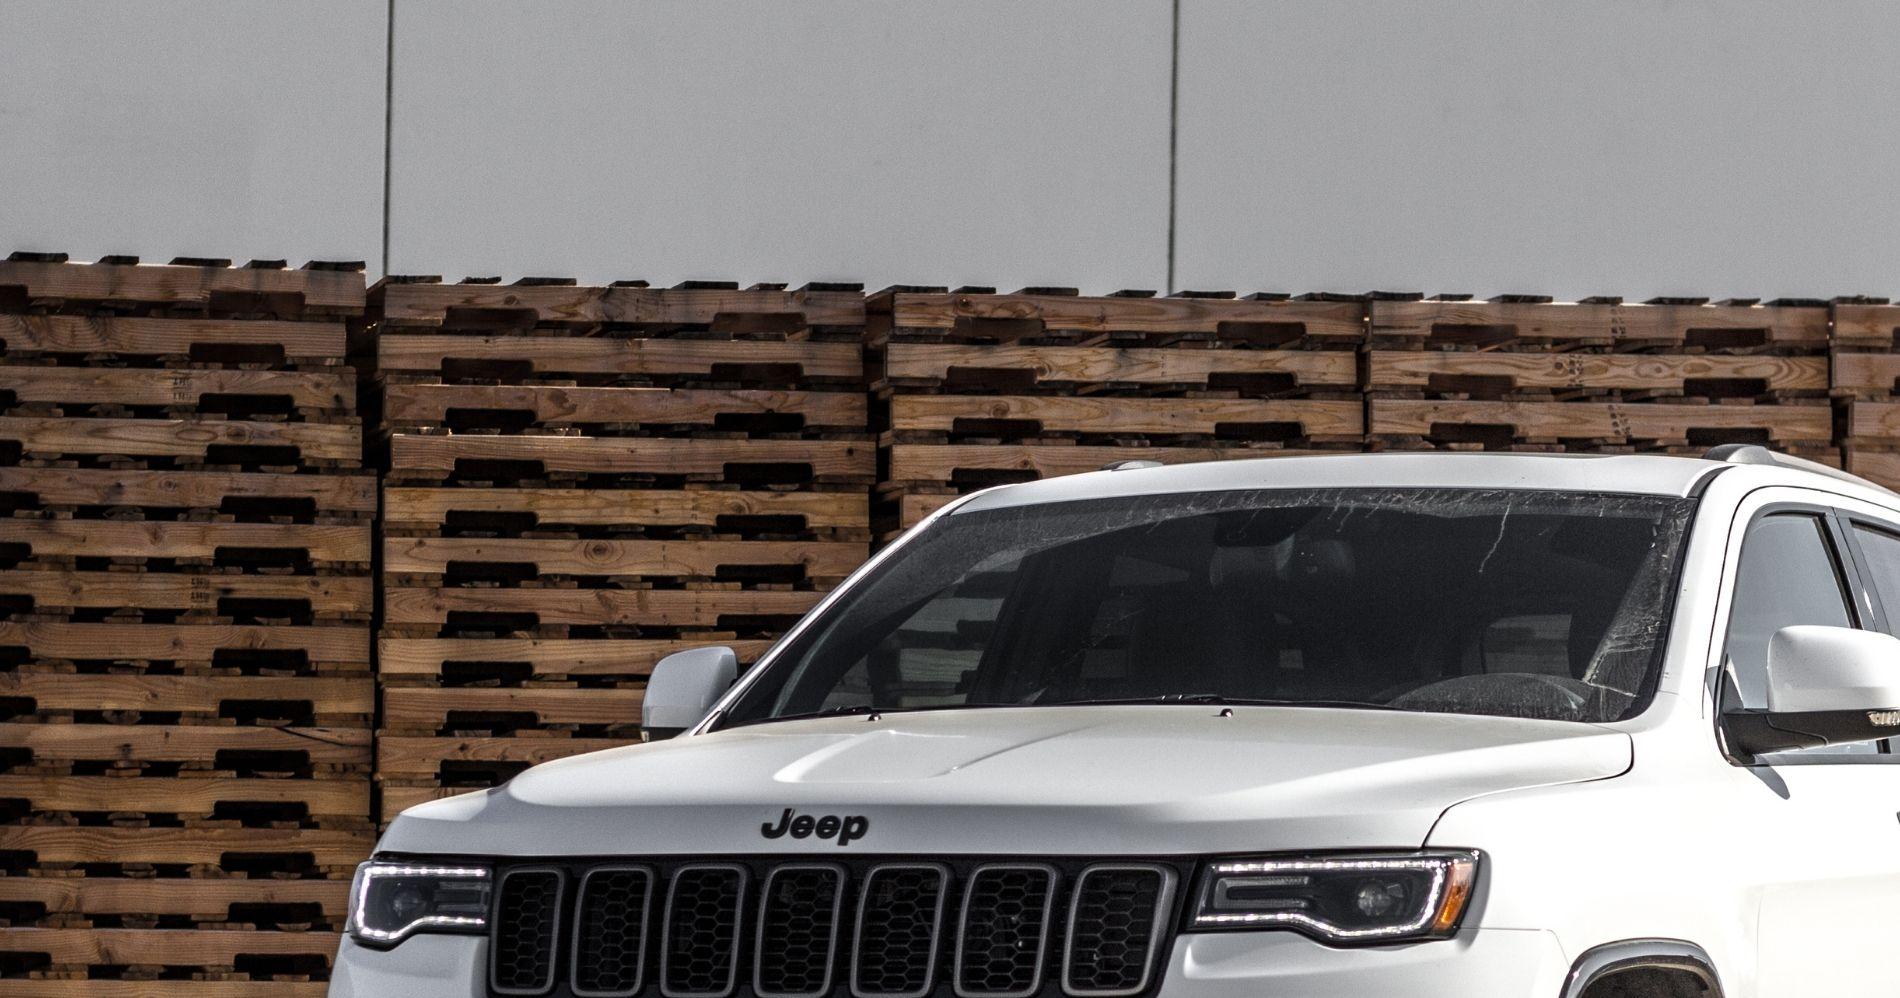 Jeep - Canva